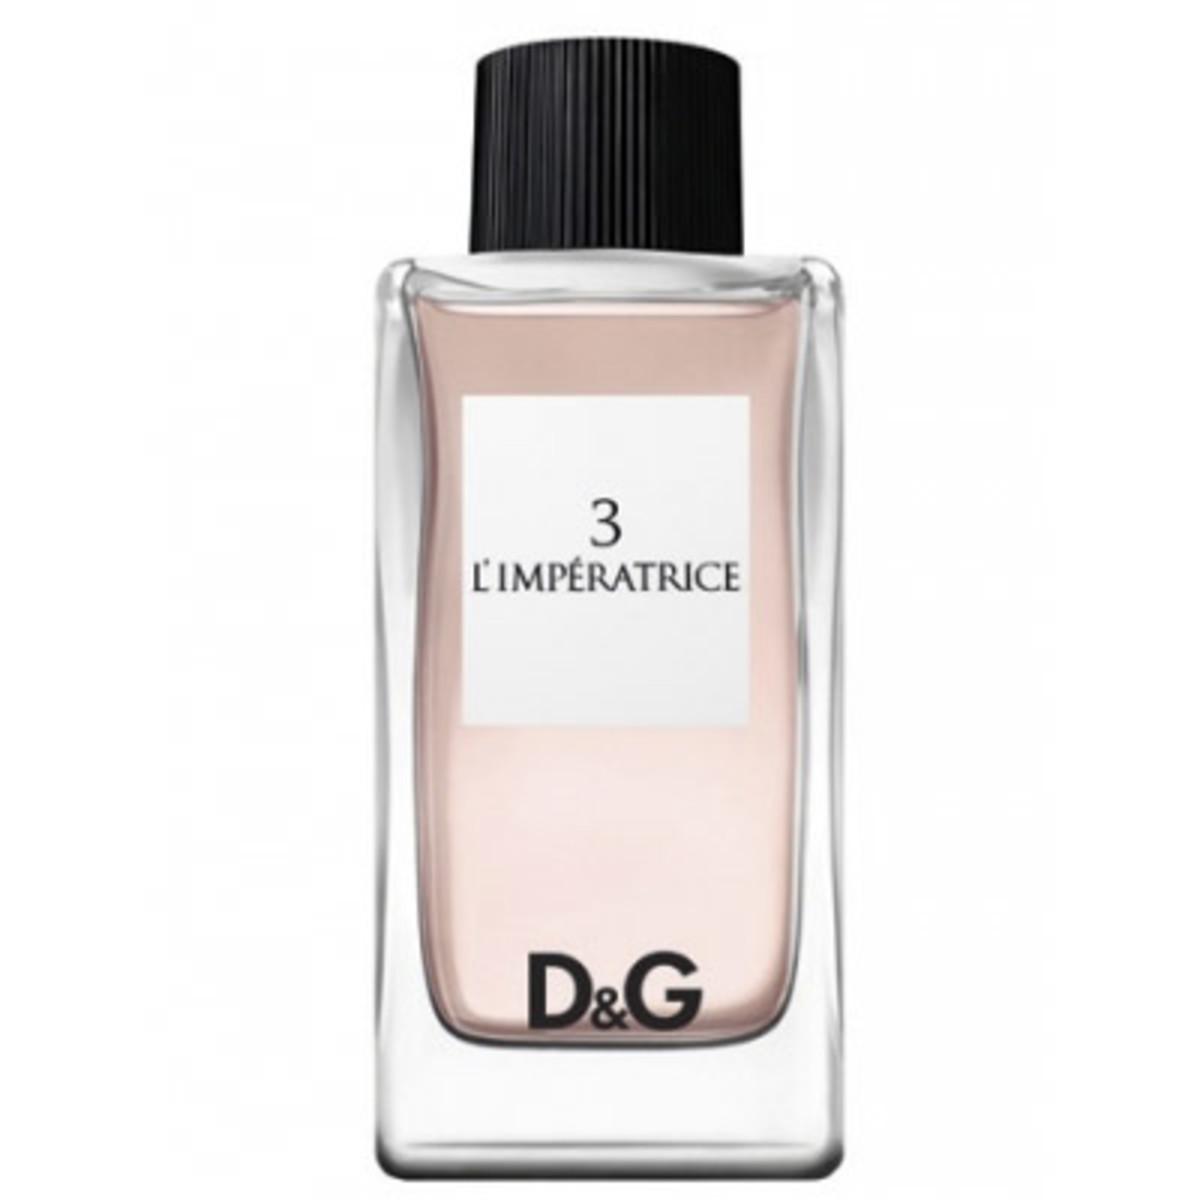 dg-fragrance-anthology-review